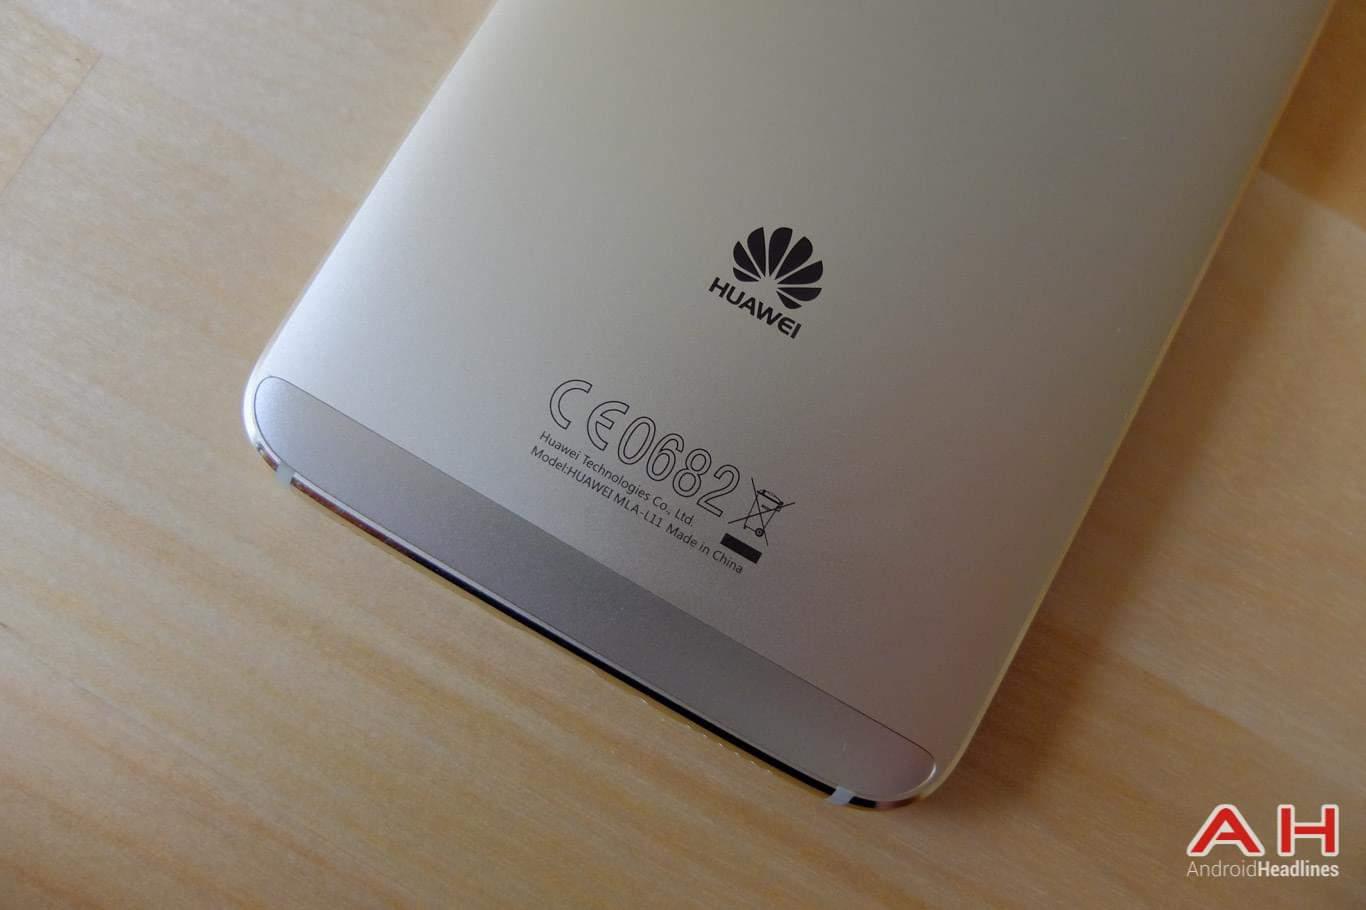 Huawei Nova Plus TD AH 10